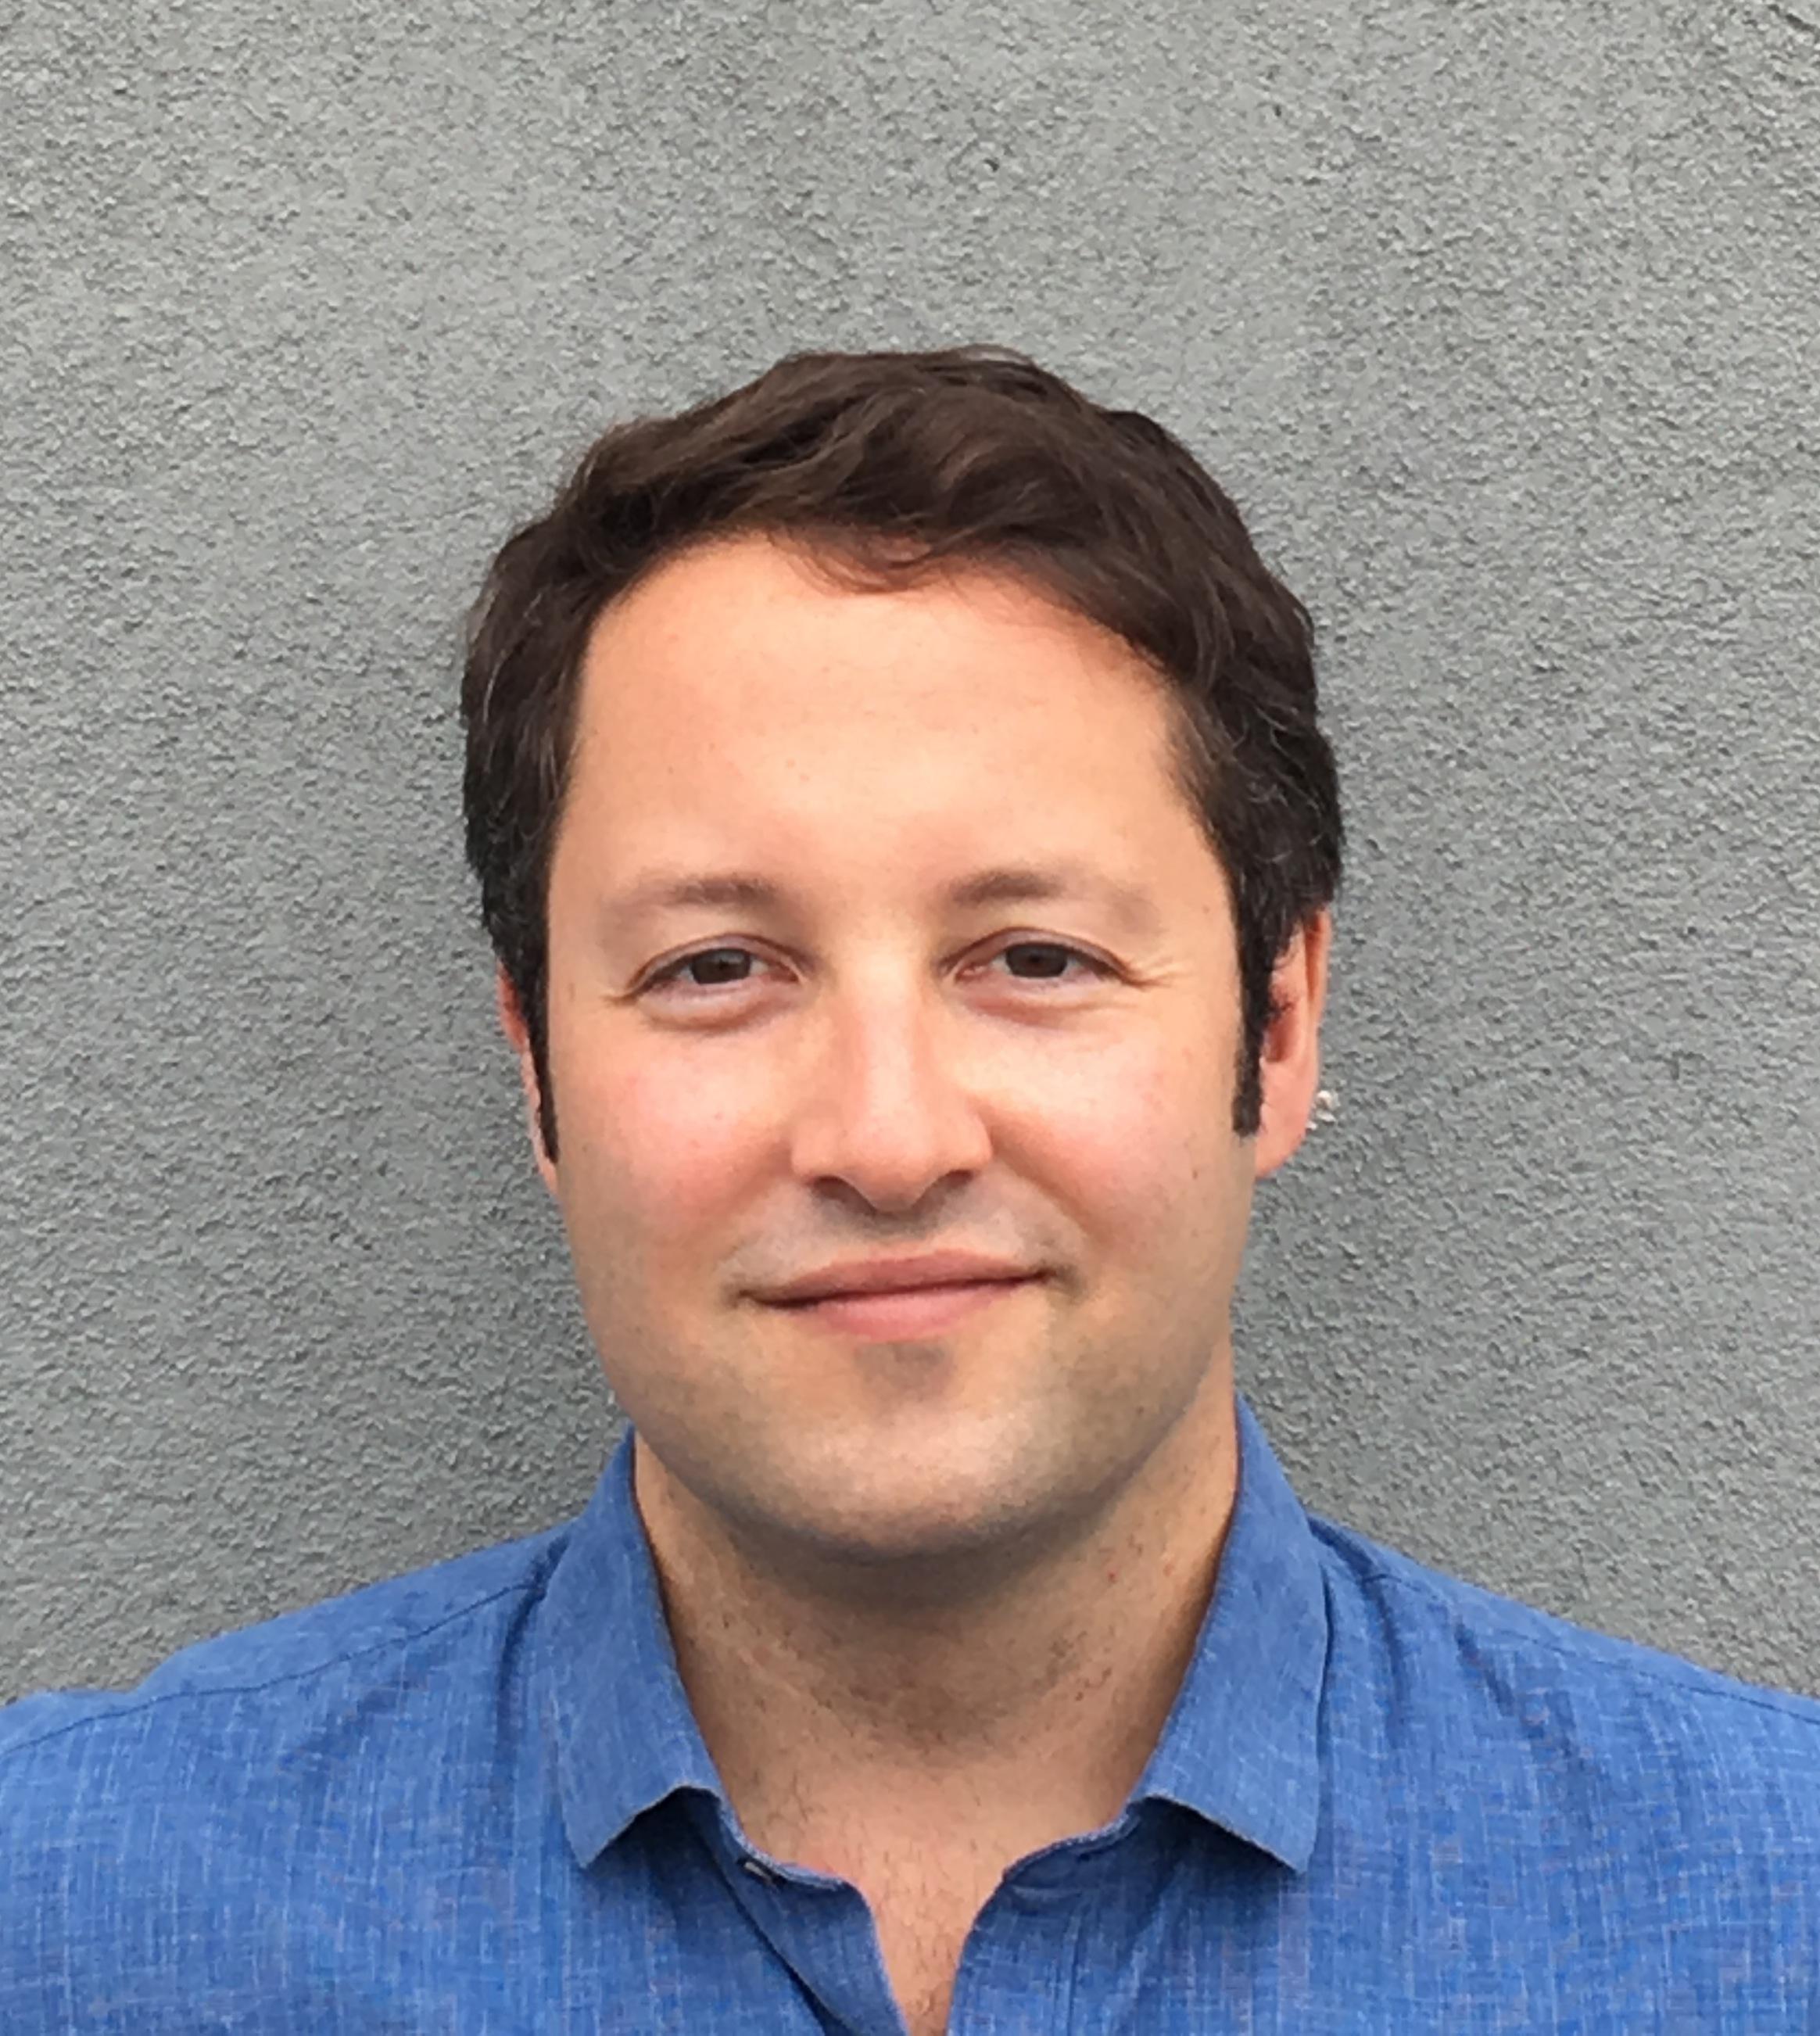 Profile picture of Max Holleran